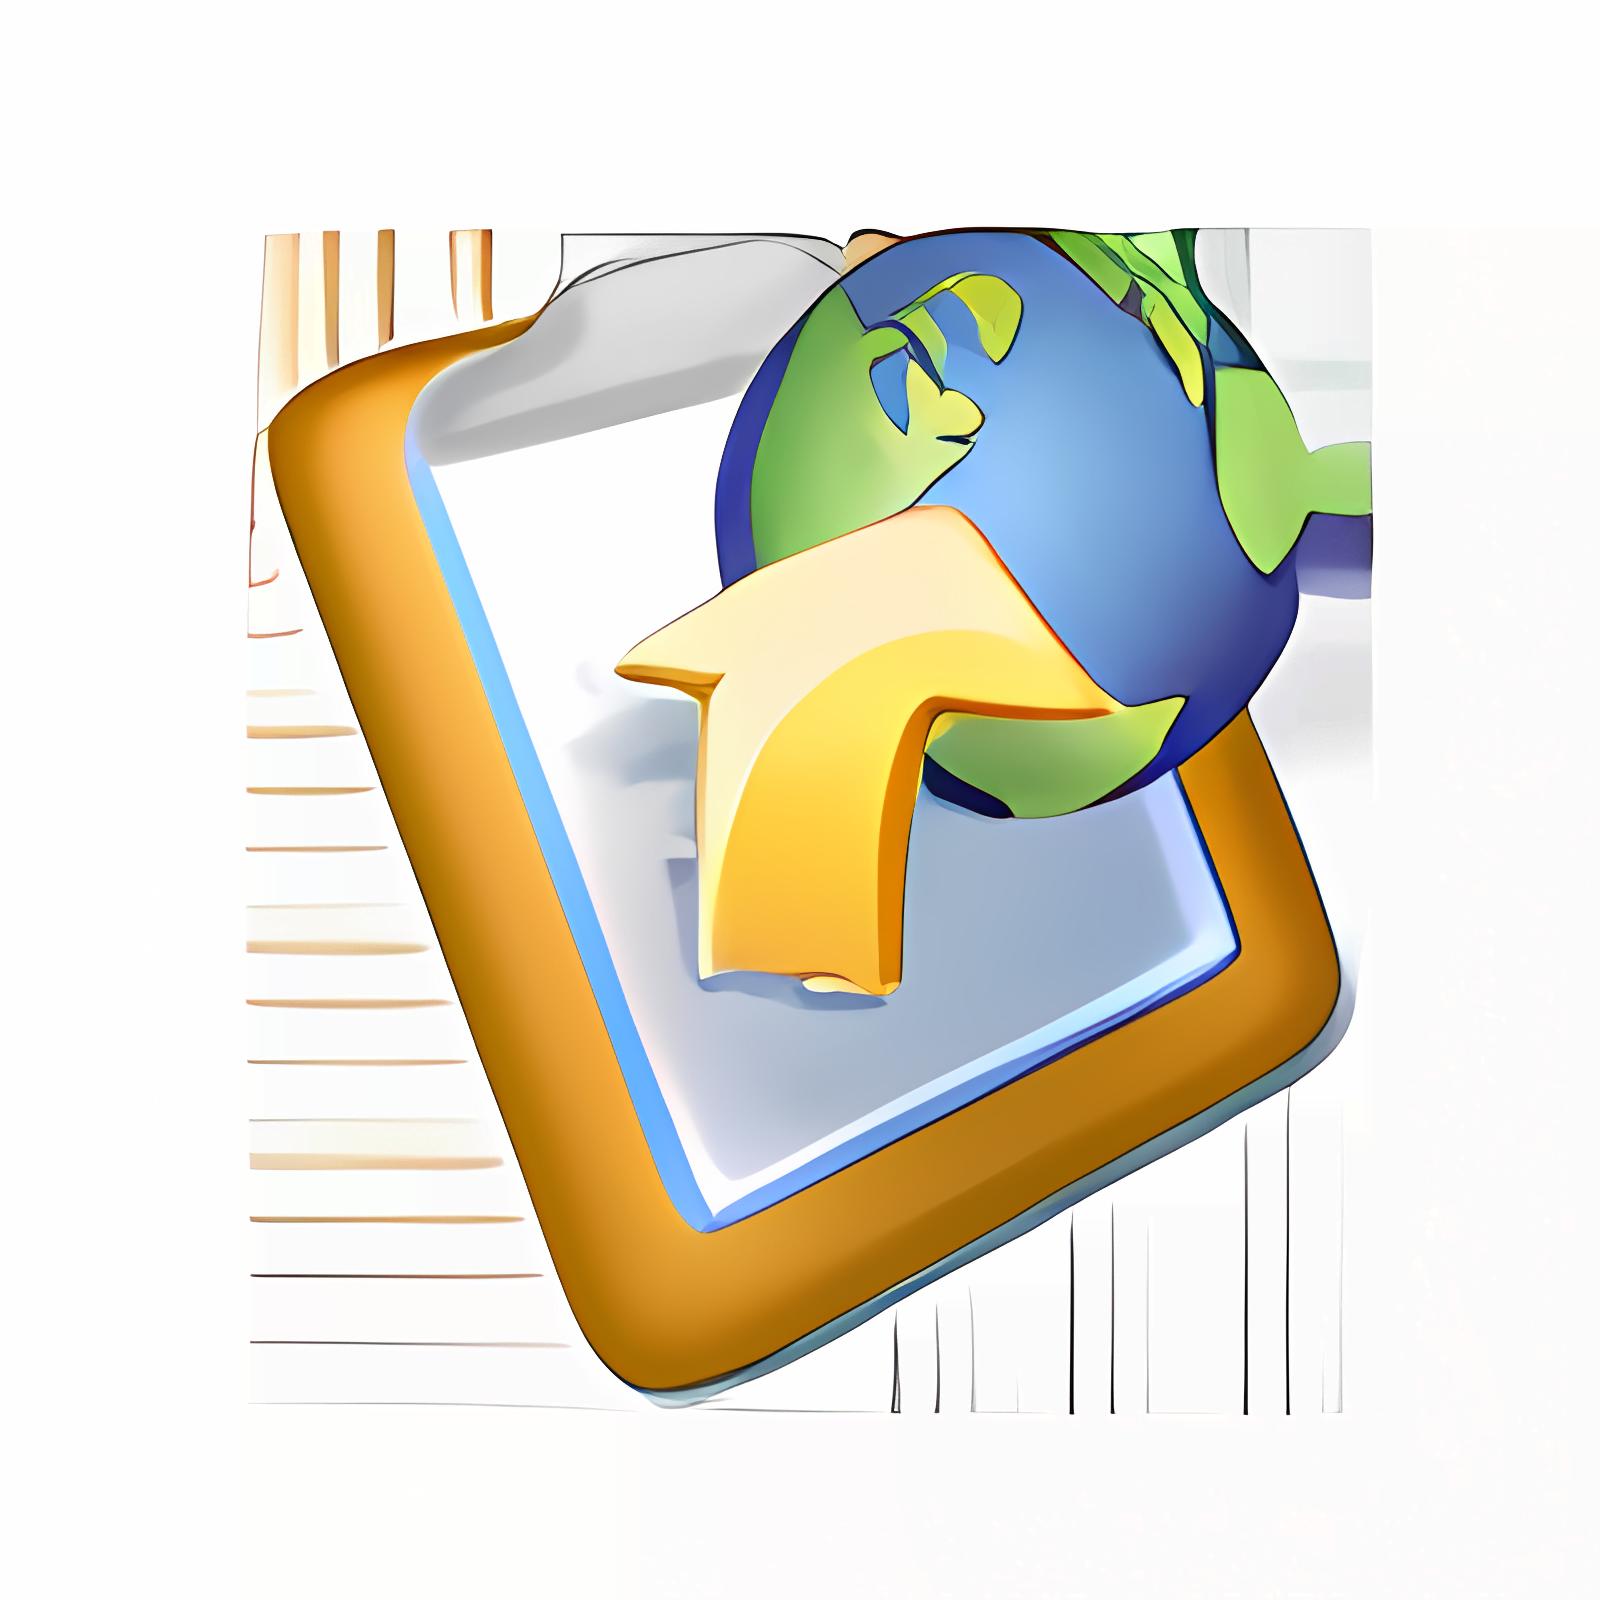 Ybex Clipboard 1.3